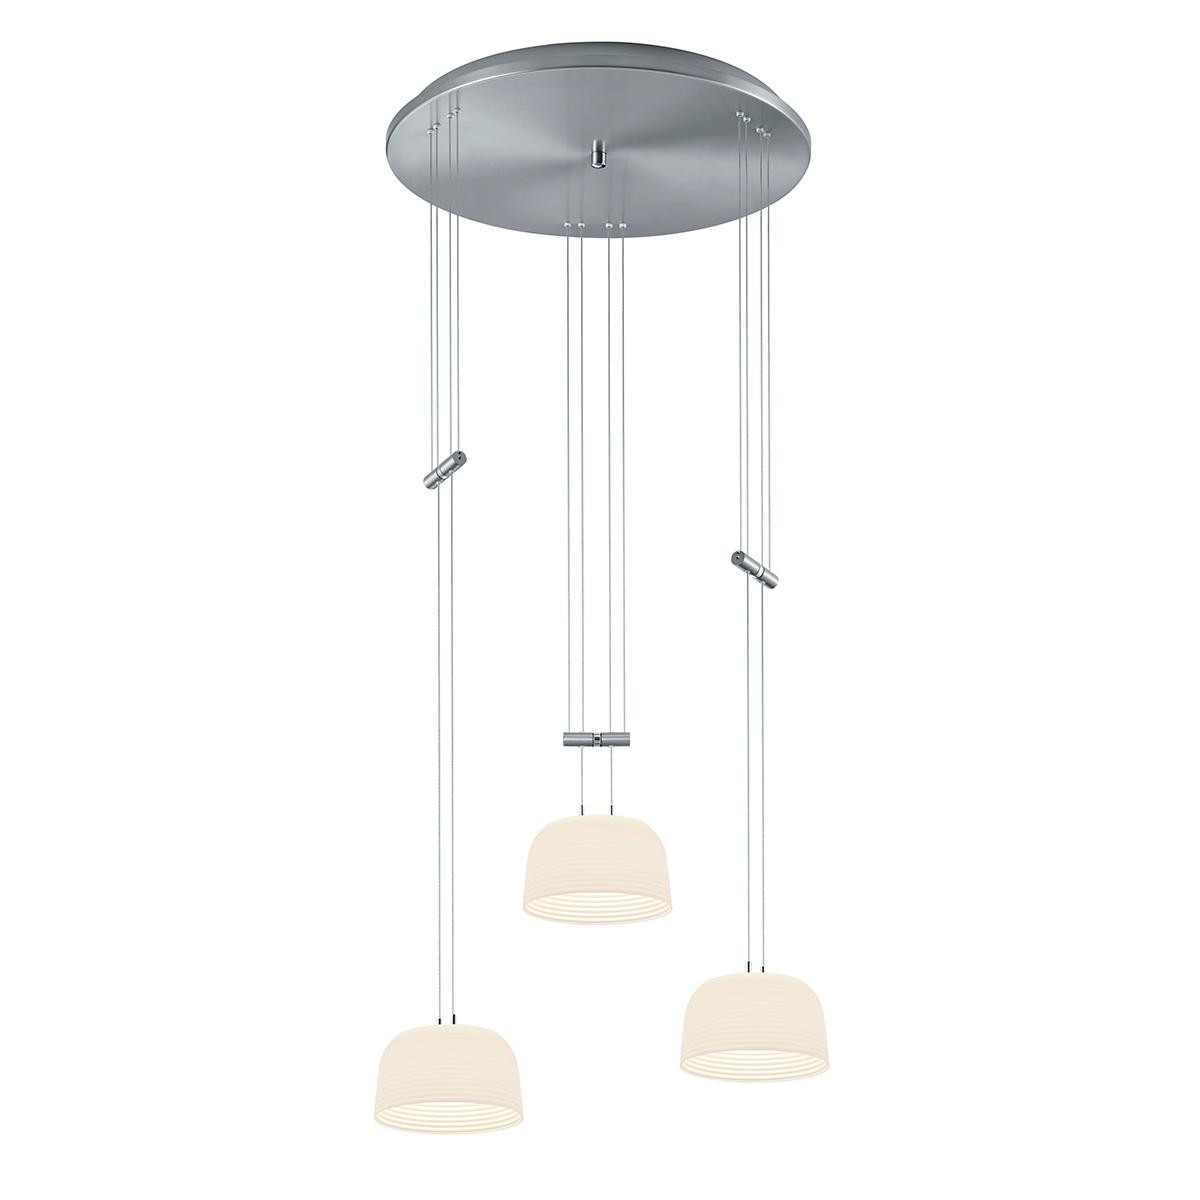 Bankamp Nelia LED Pendelleuchte, 3-flg., mit Rondell 2200/3-92